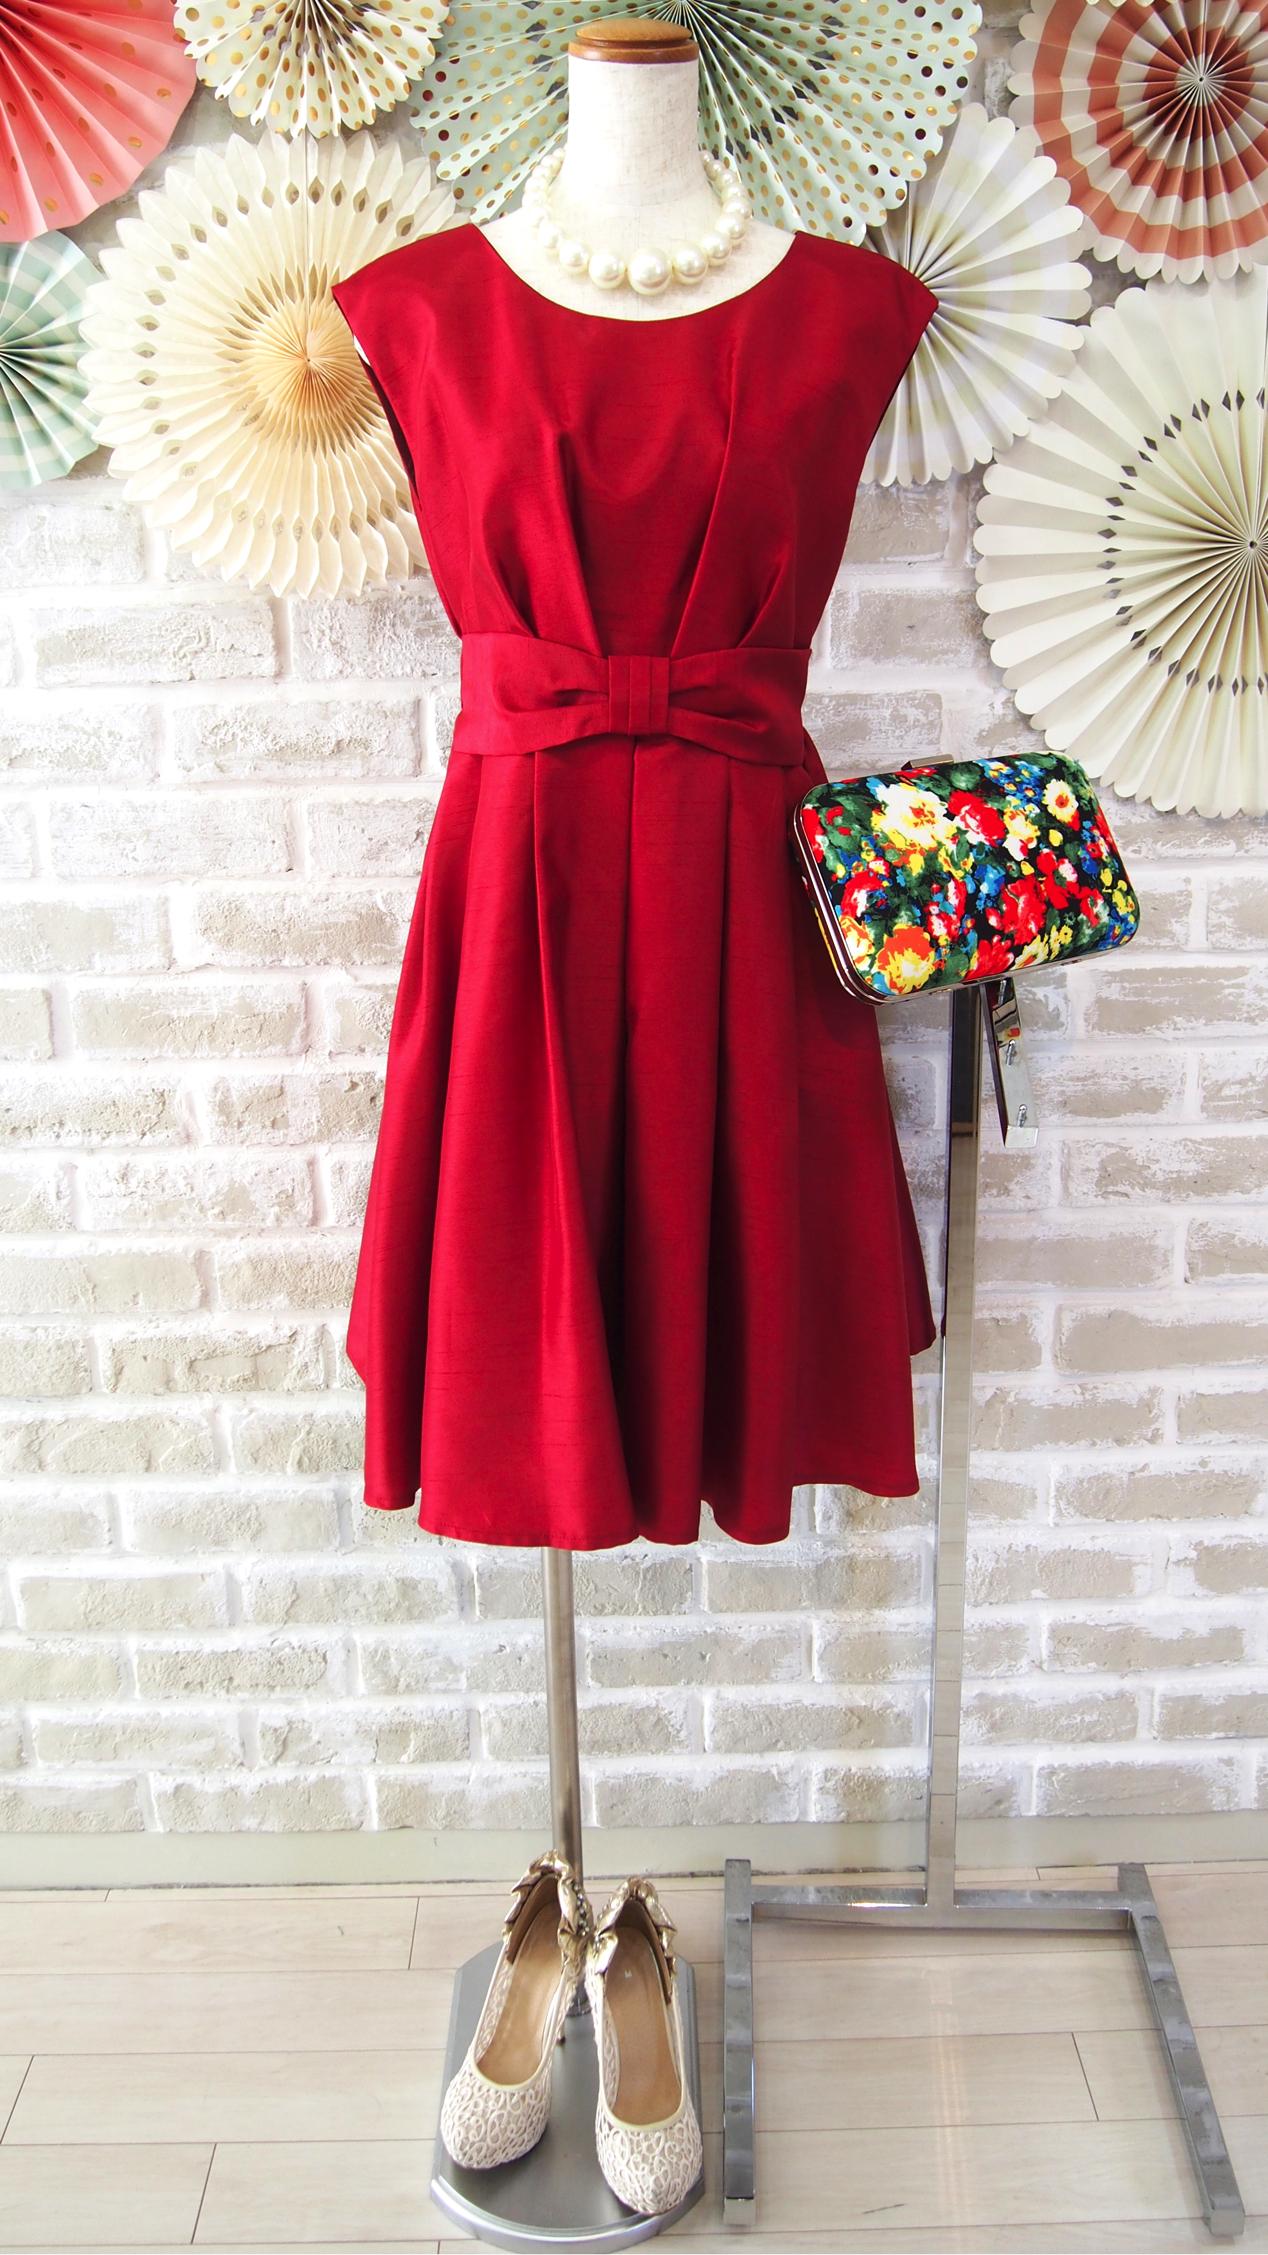 nr_dress_655